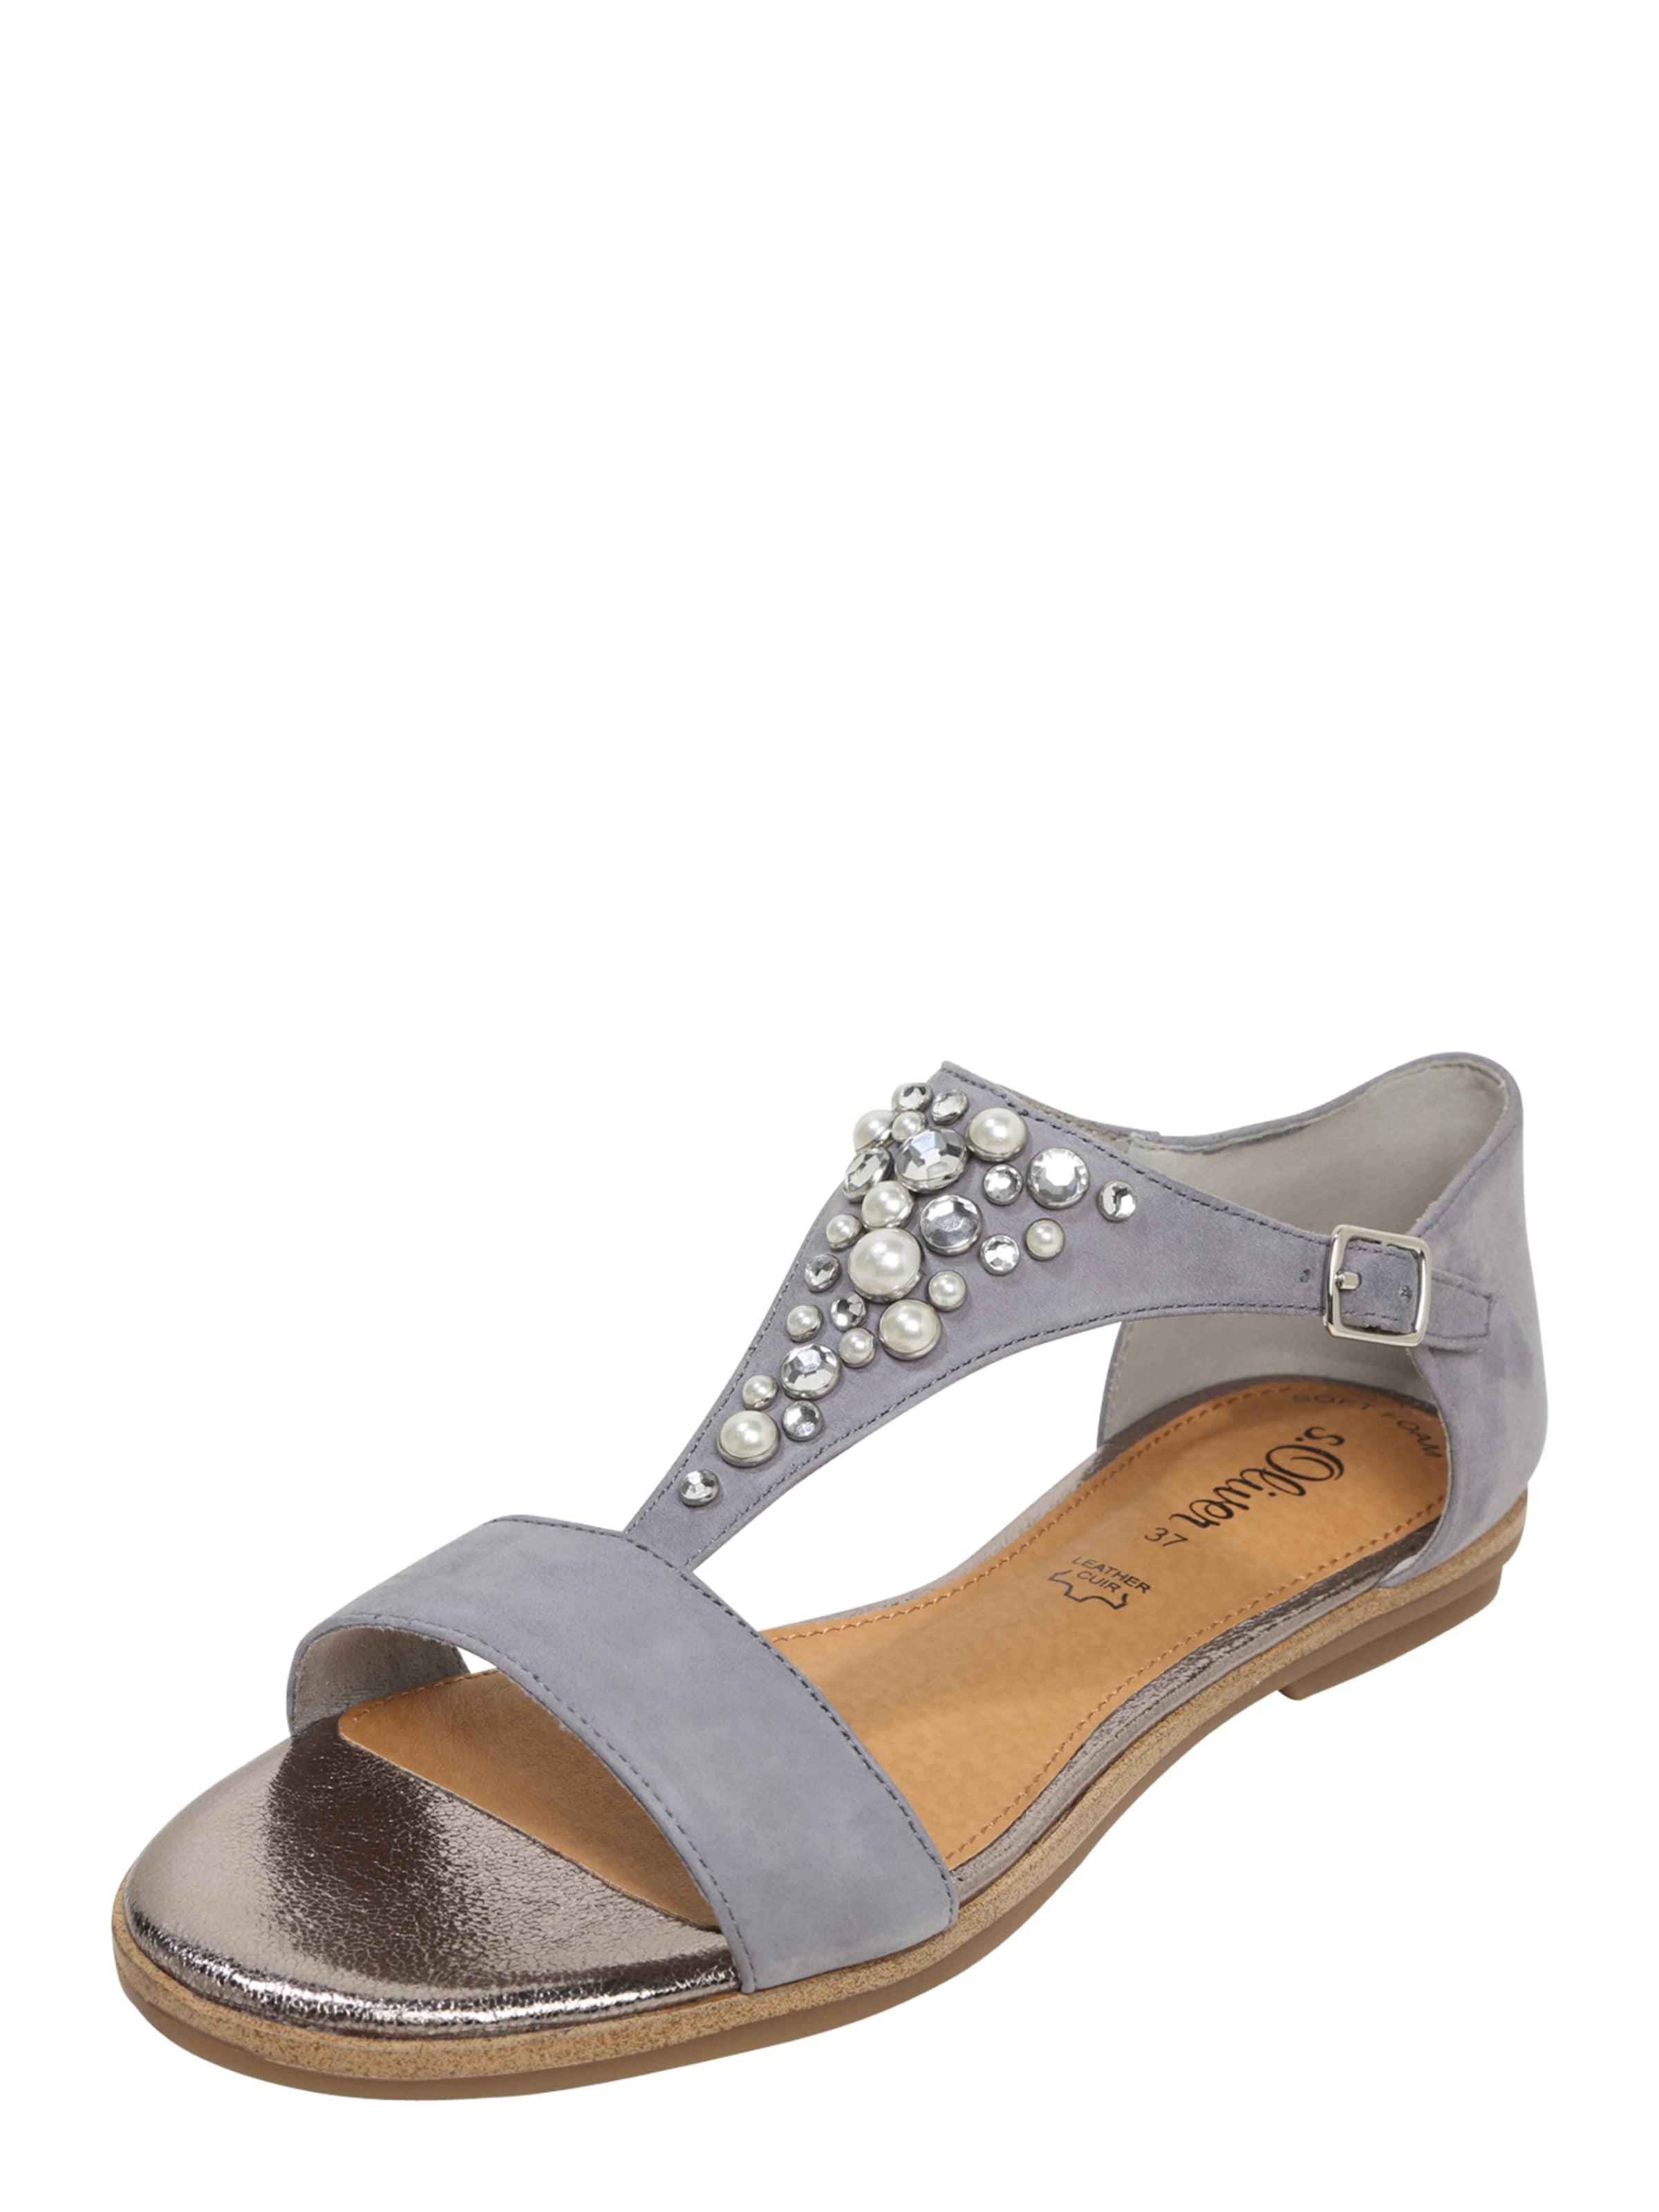 S.oliver « Confortable » Noir Sandale Étiquette Rouge Inur90fLjA